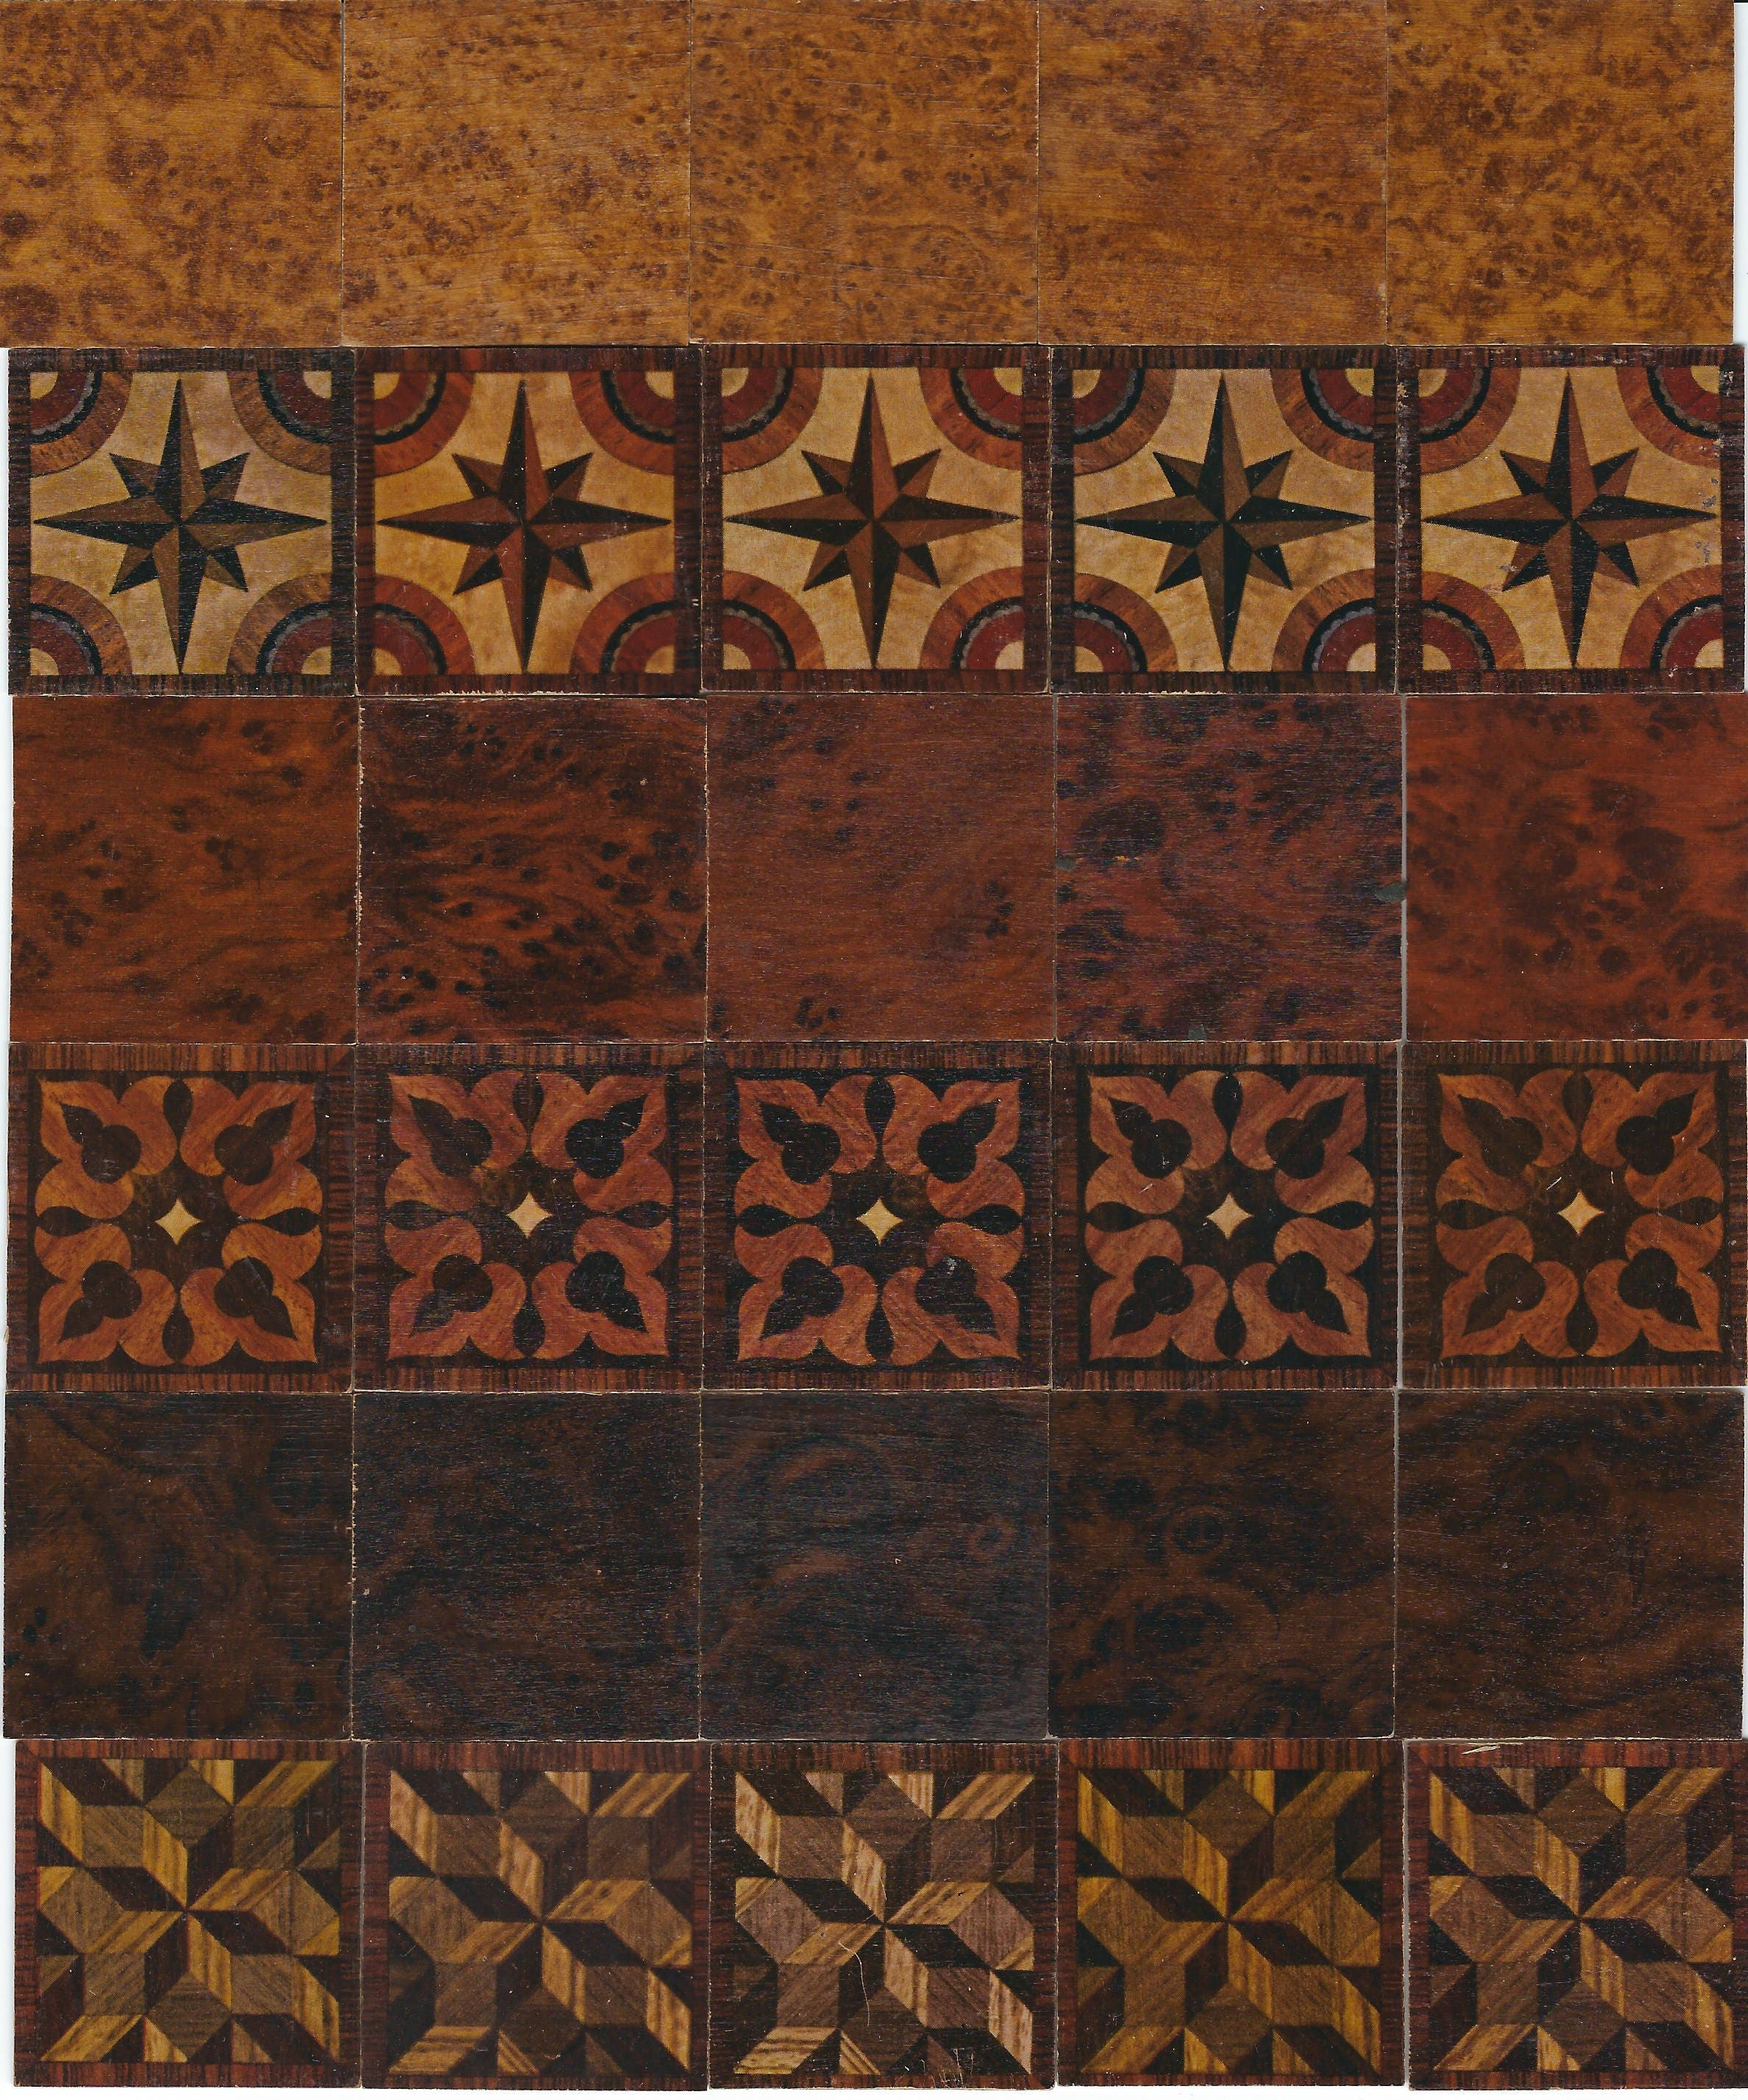 marquetry tiny wooden tiles garbaty tarso holzbilder cards | etsy